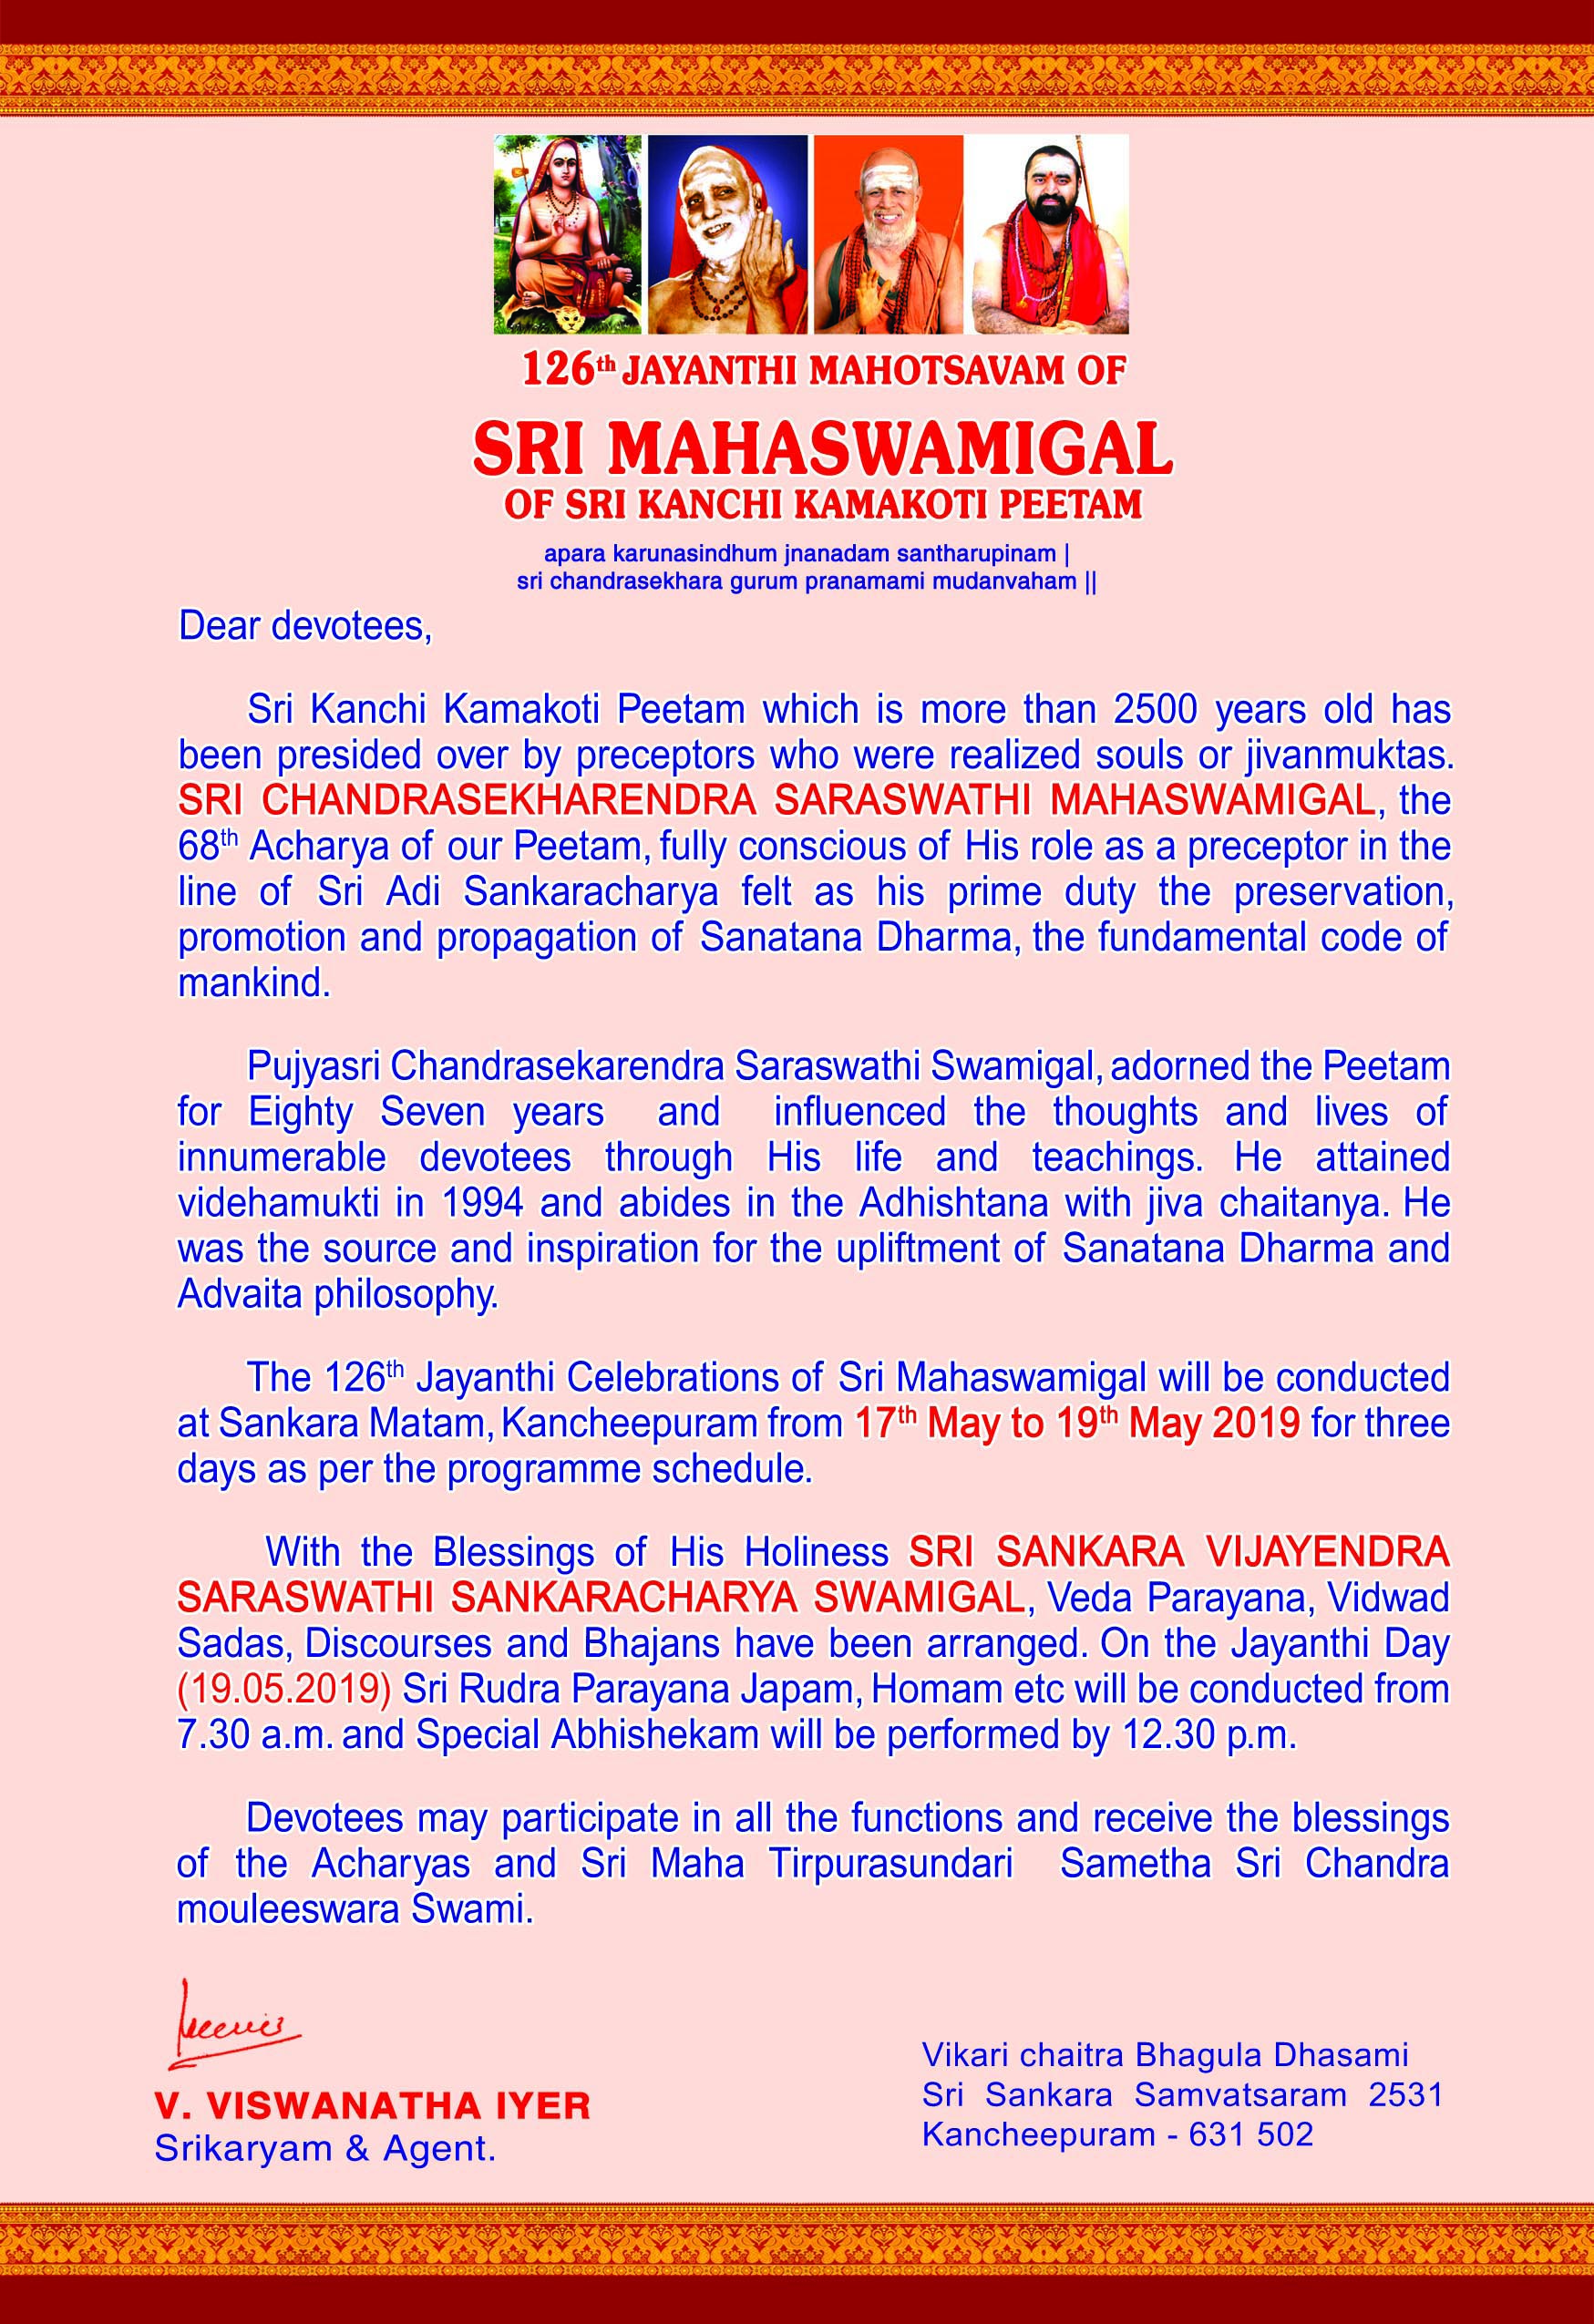 Jayanti Mahotsavam of HH Pujyashri Chandrasekharendra